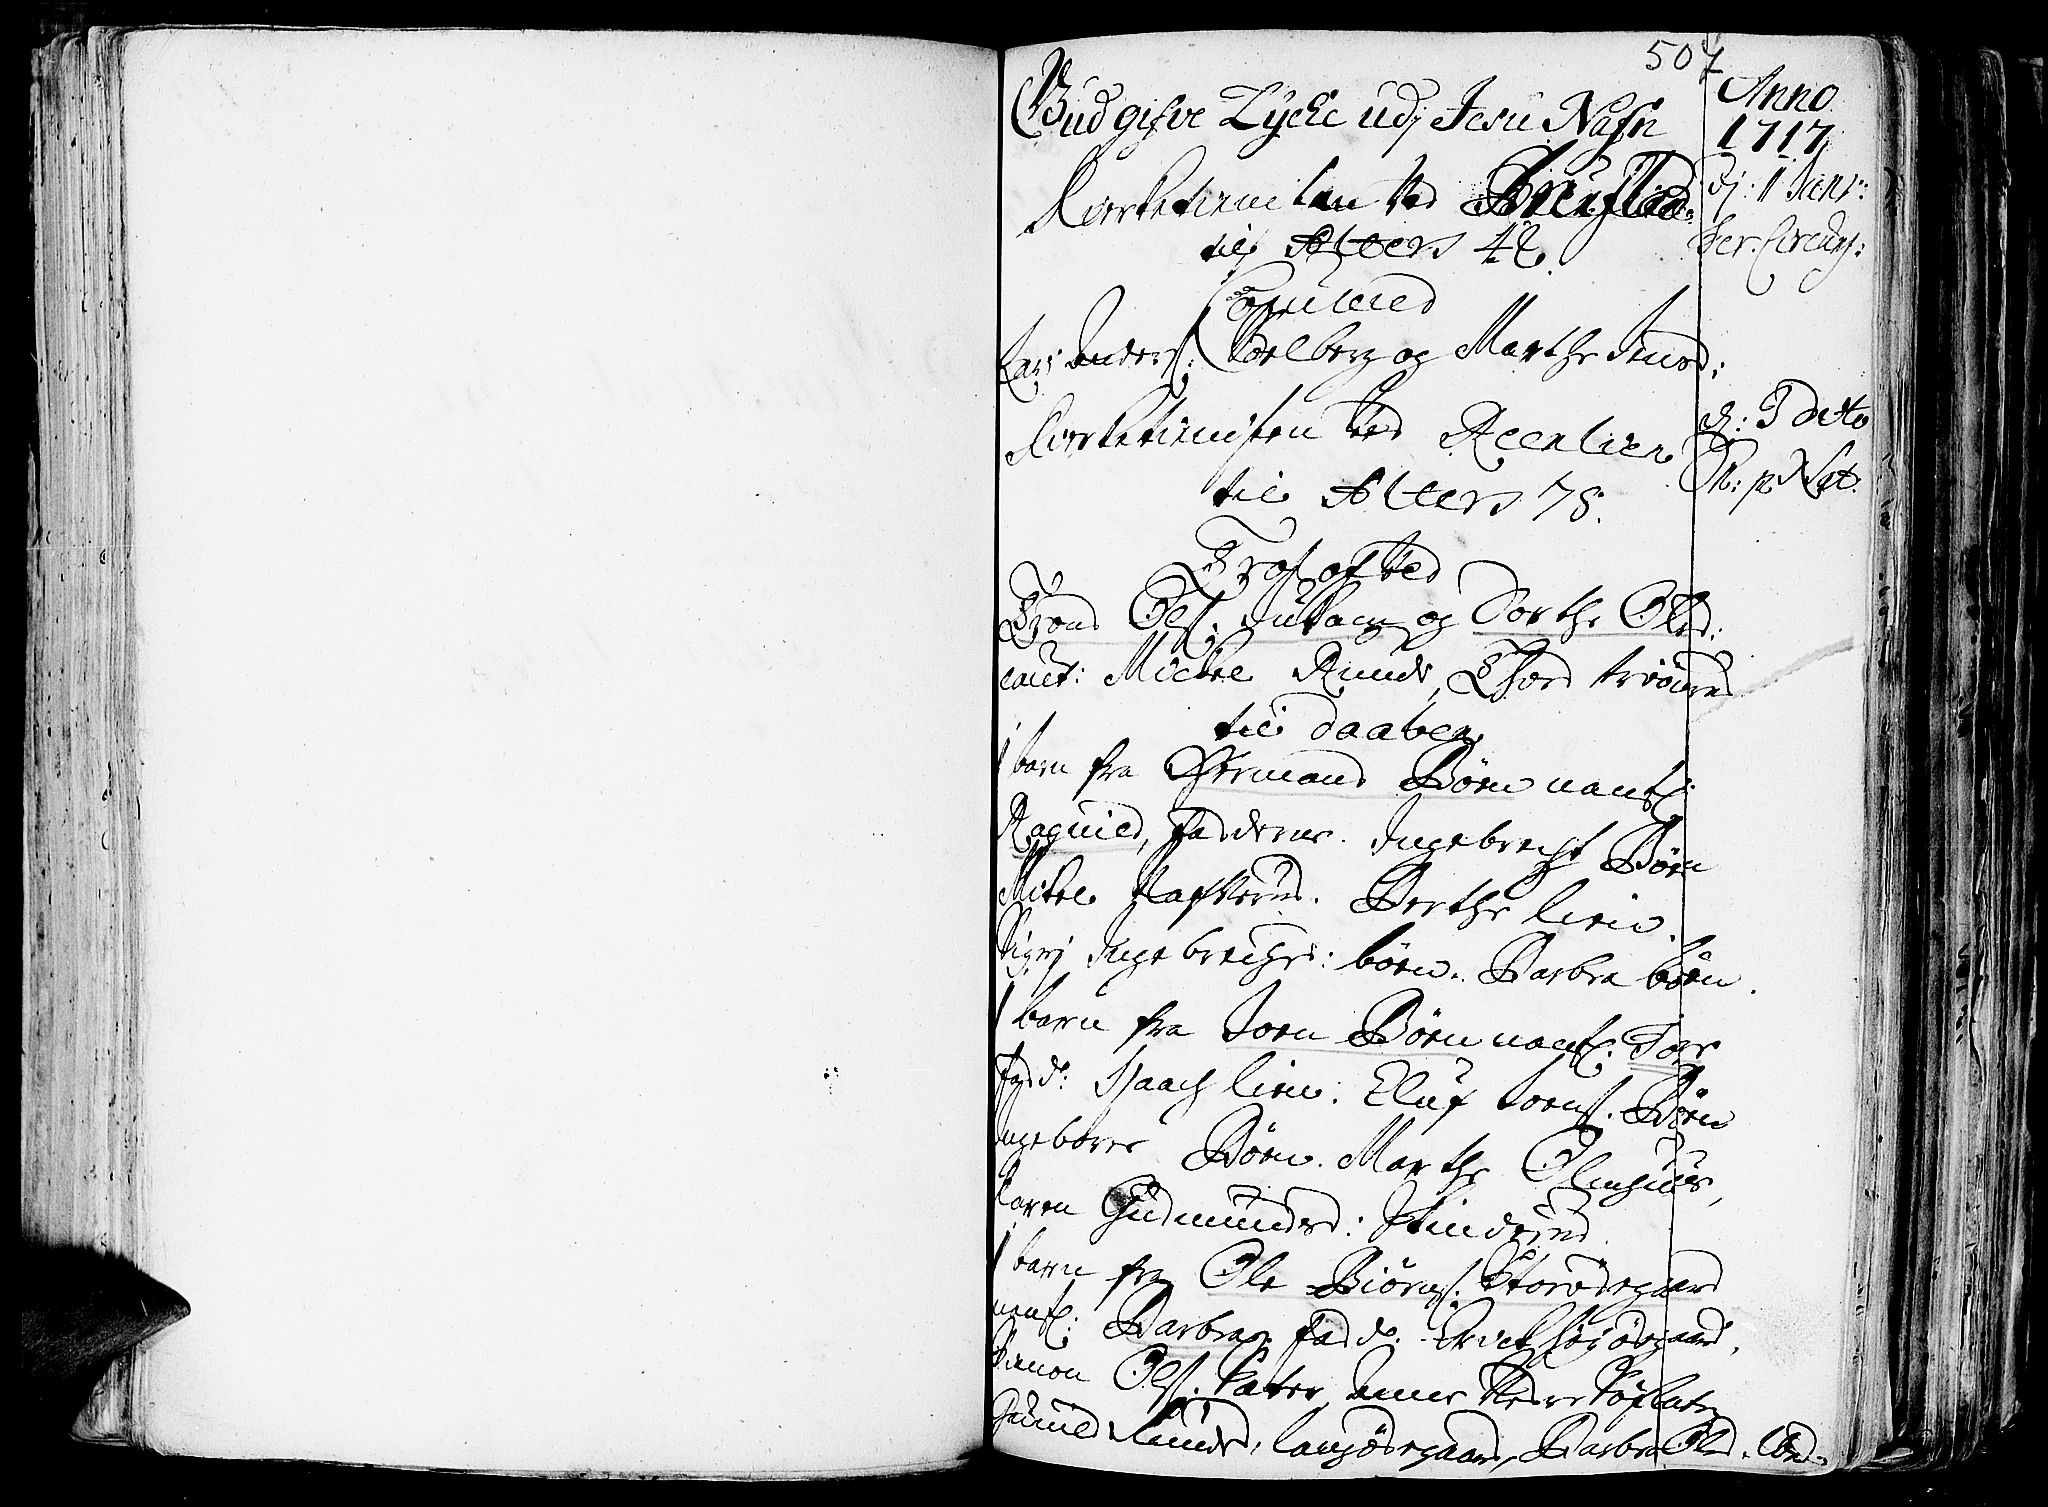 SAH, Aurdal prestekontor, Ministerialbok nr. 1-3, 1692-1730, s. 507